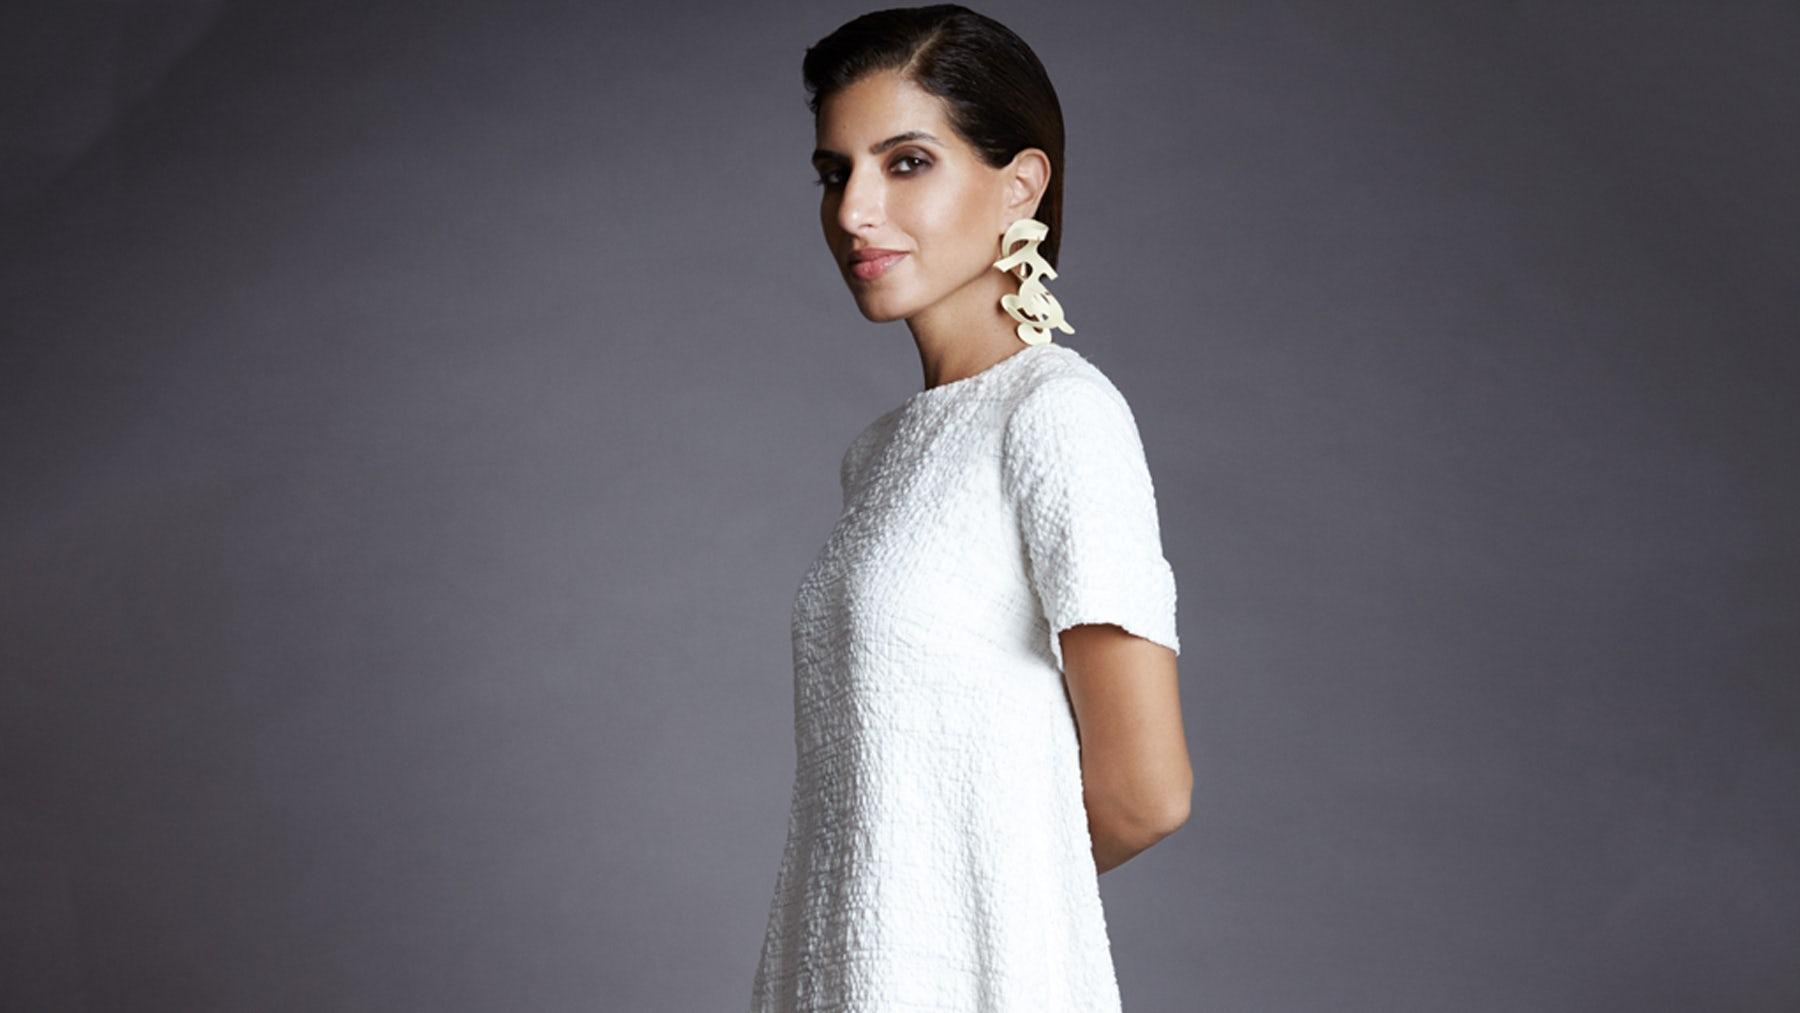 Deena Aljuhani Abdulaziz, editor-in-chief of Vogue Arabia   Source: Courtesy